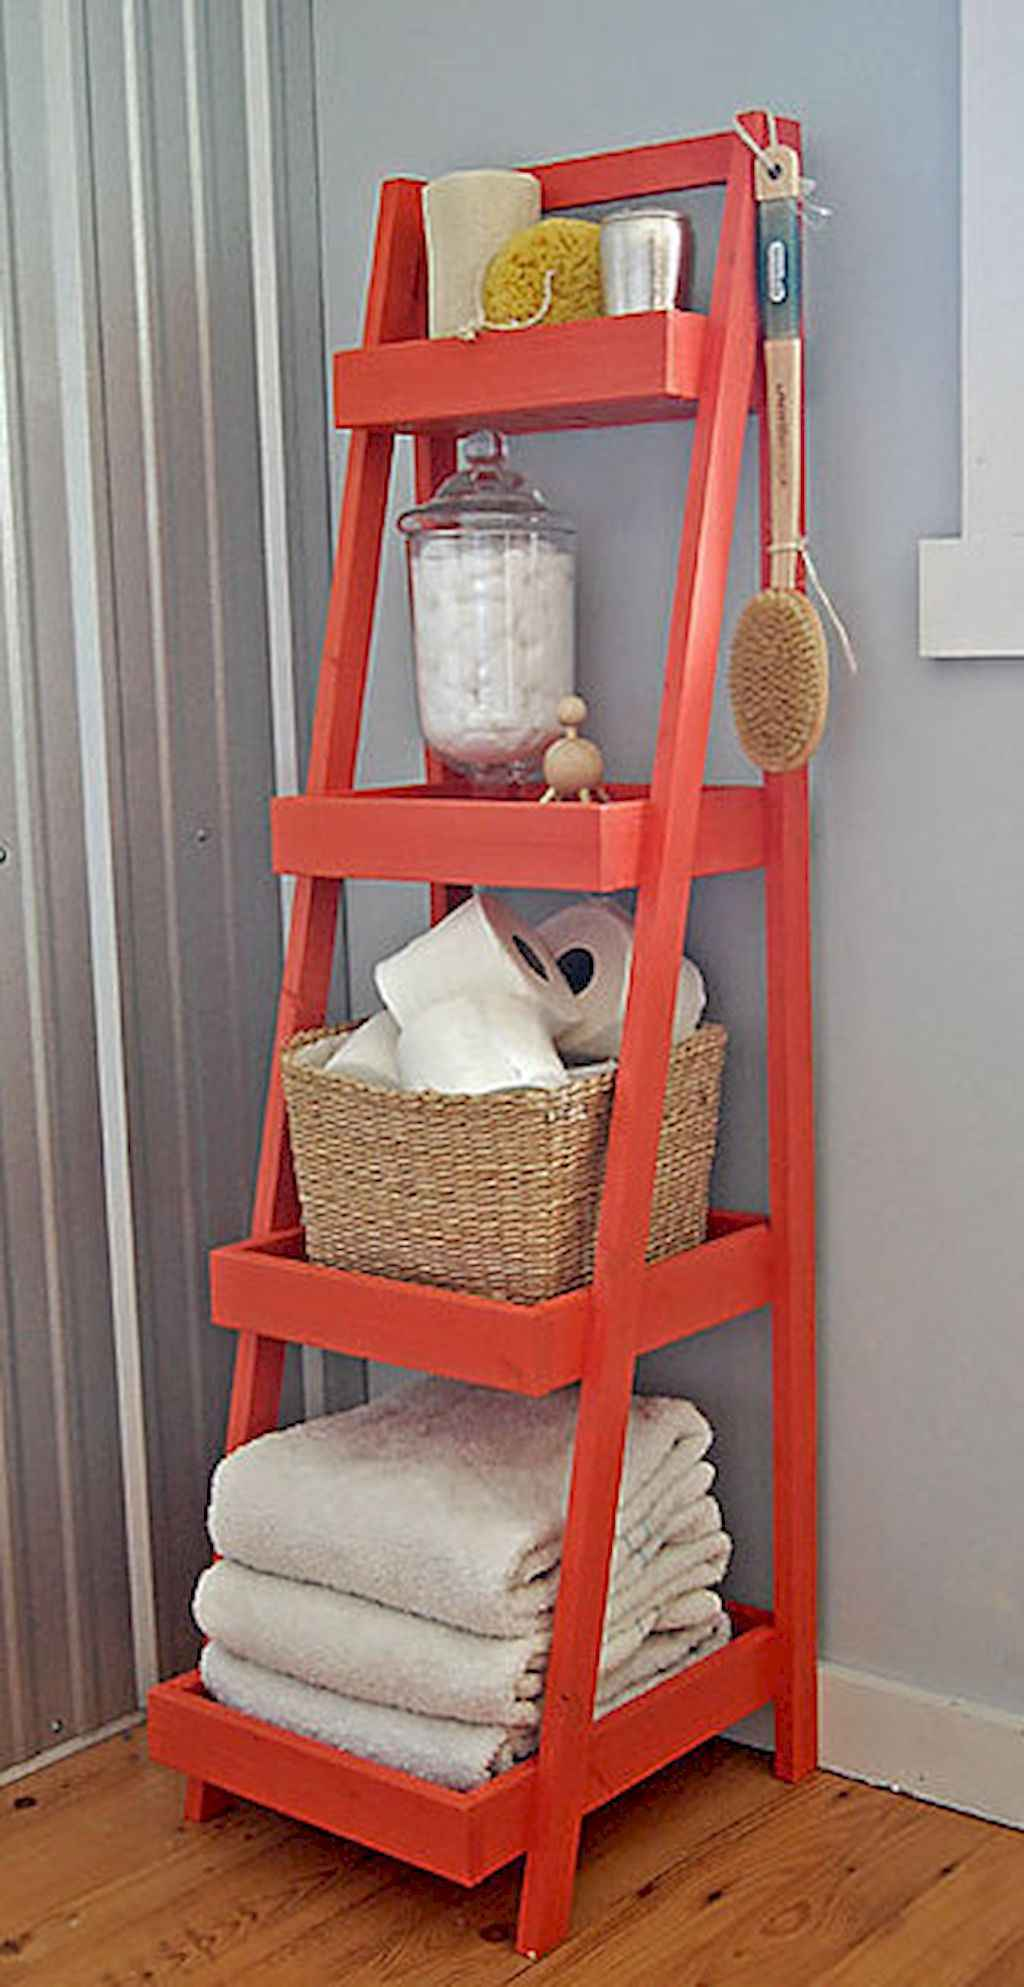 Small apartment decorating ideas (13)